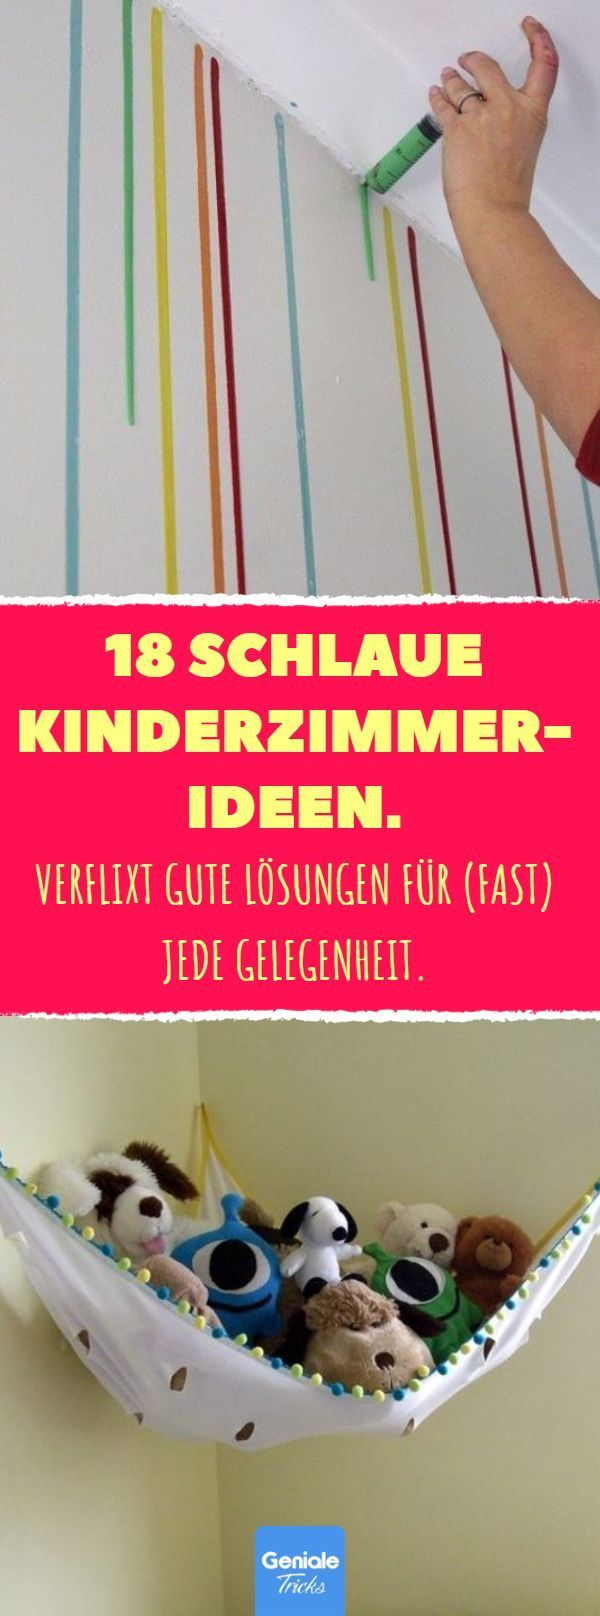 18 schlaue Kinderzimmer-Ideen. #kinderzimmerdeko